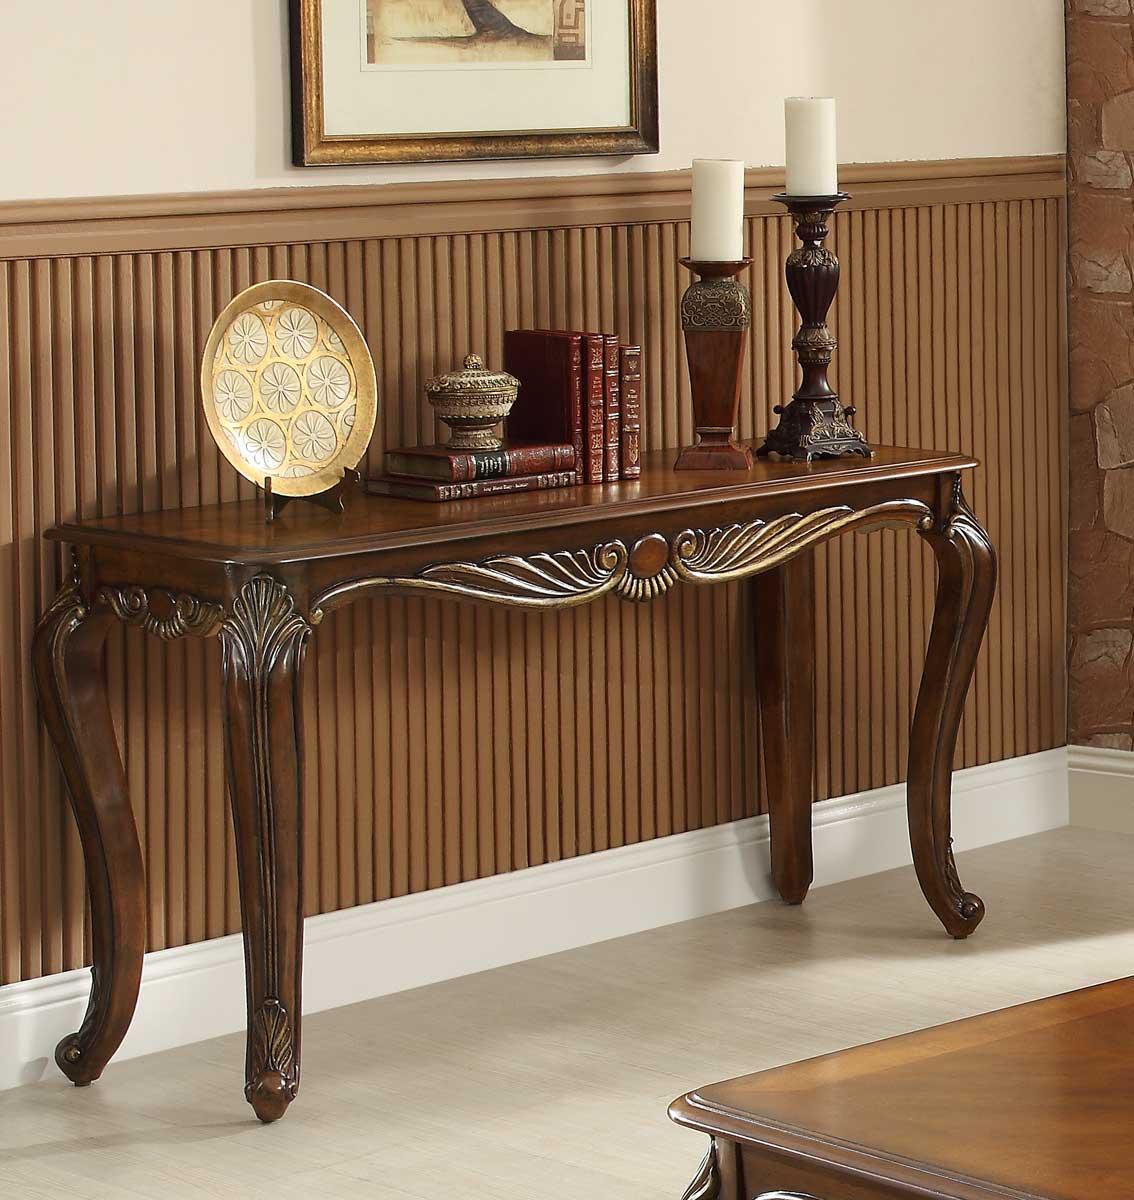 Homelegance Lambeth II Sofa Table - Rich Cherry